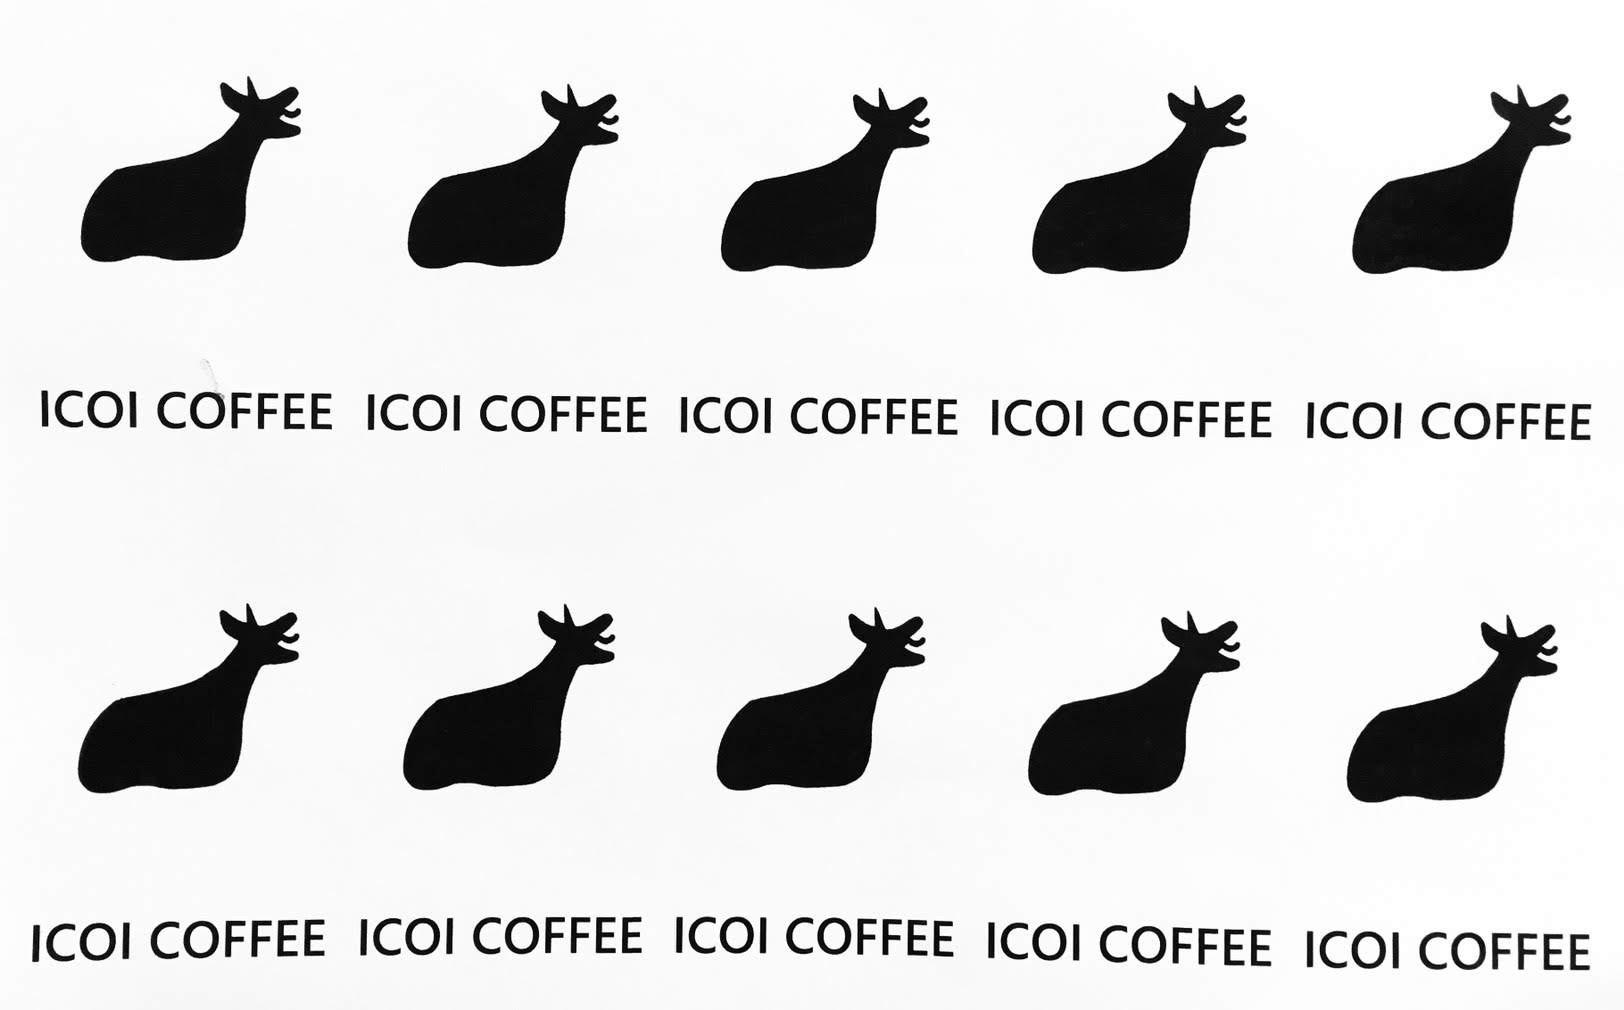 ICOI COFFEE